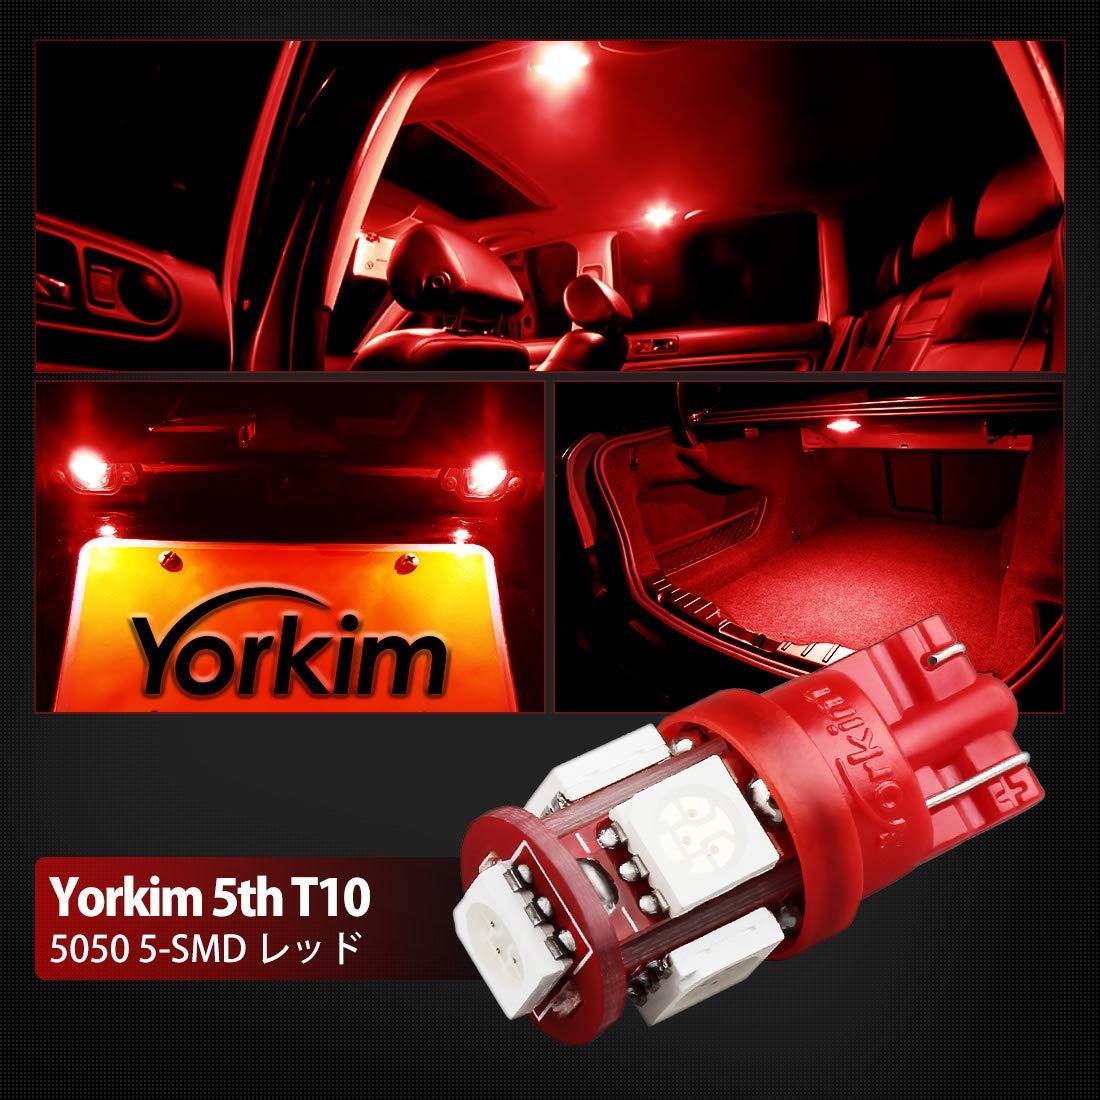 194 LED Interior Lights for Car W5W LED Bulb Yorkim 194 LED Bulbs White 6000k Super Bright Newest 5th Generation Universal Fit Pack of 10 2825 LED Bulb White T10 LED Bulbs 168 LED Bulb White T10